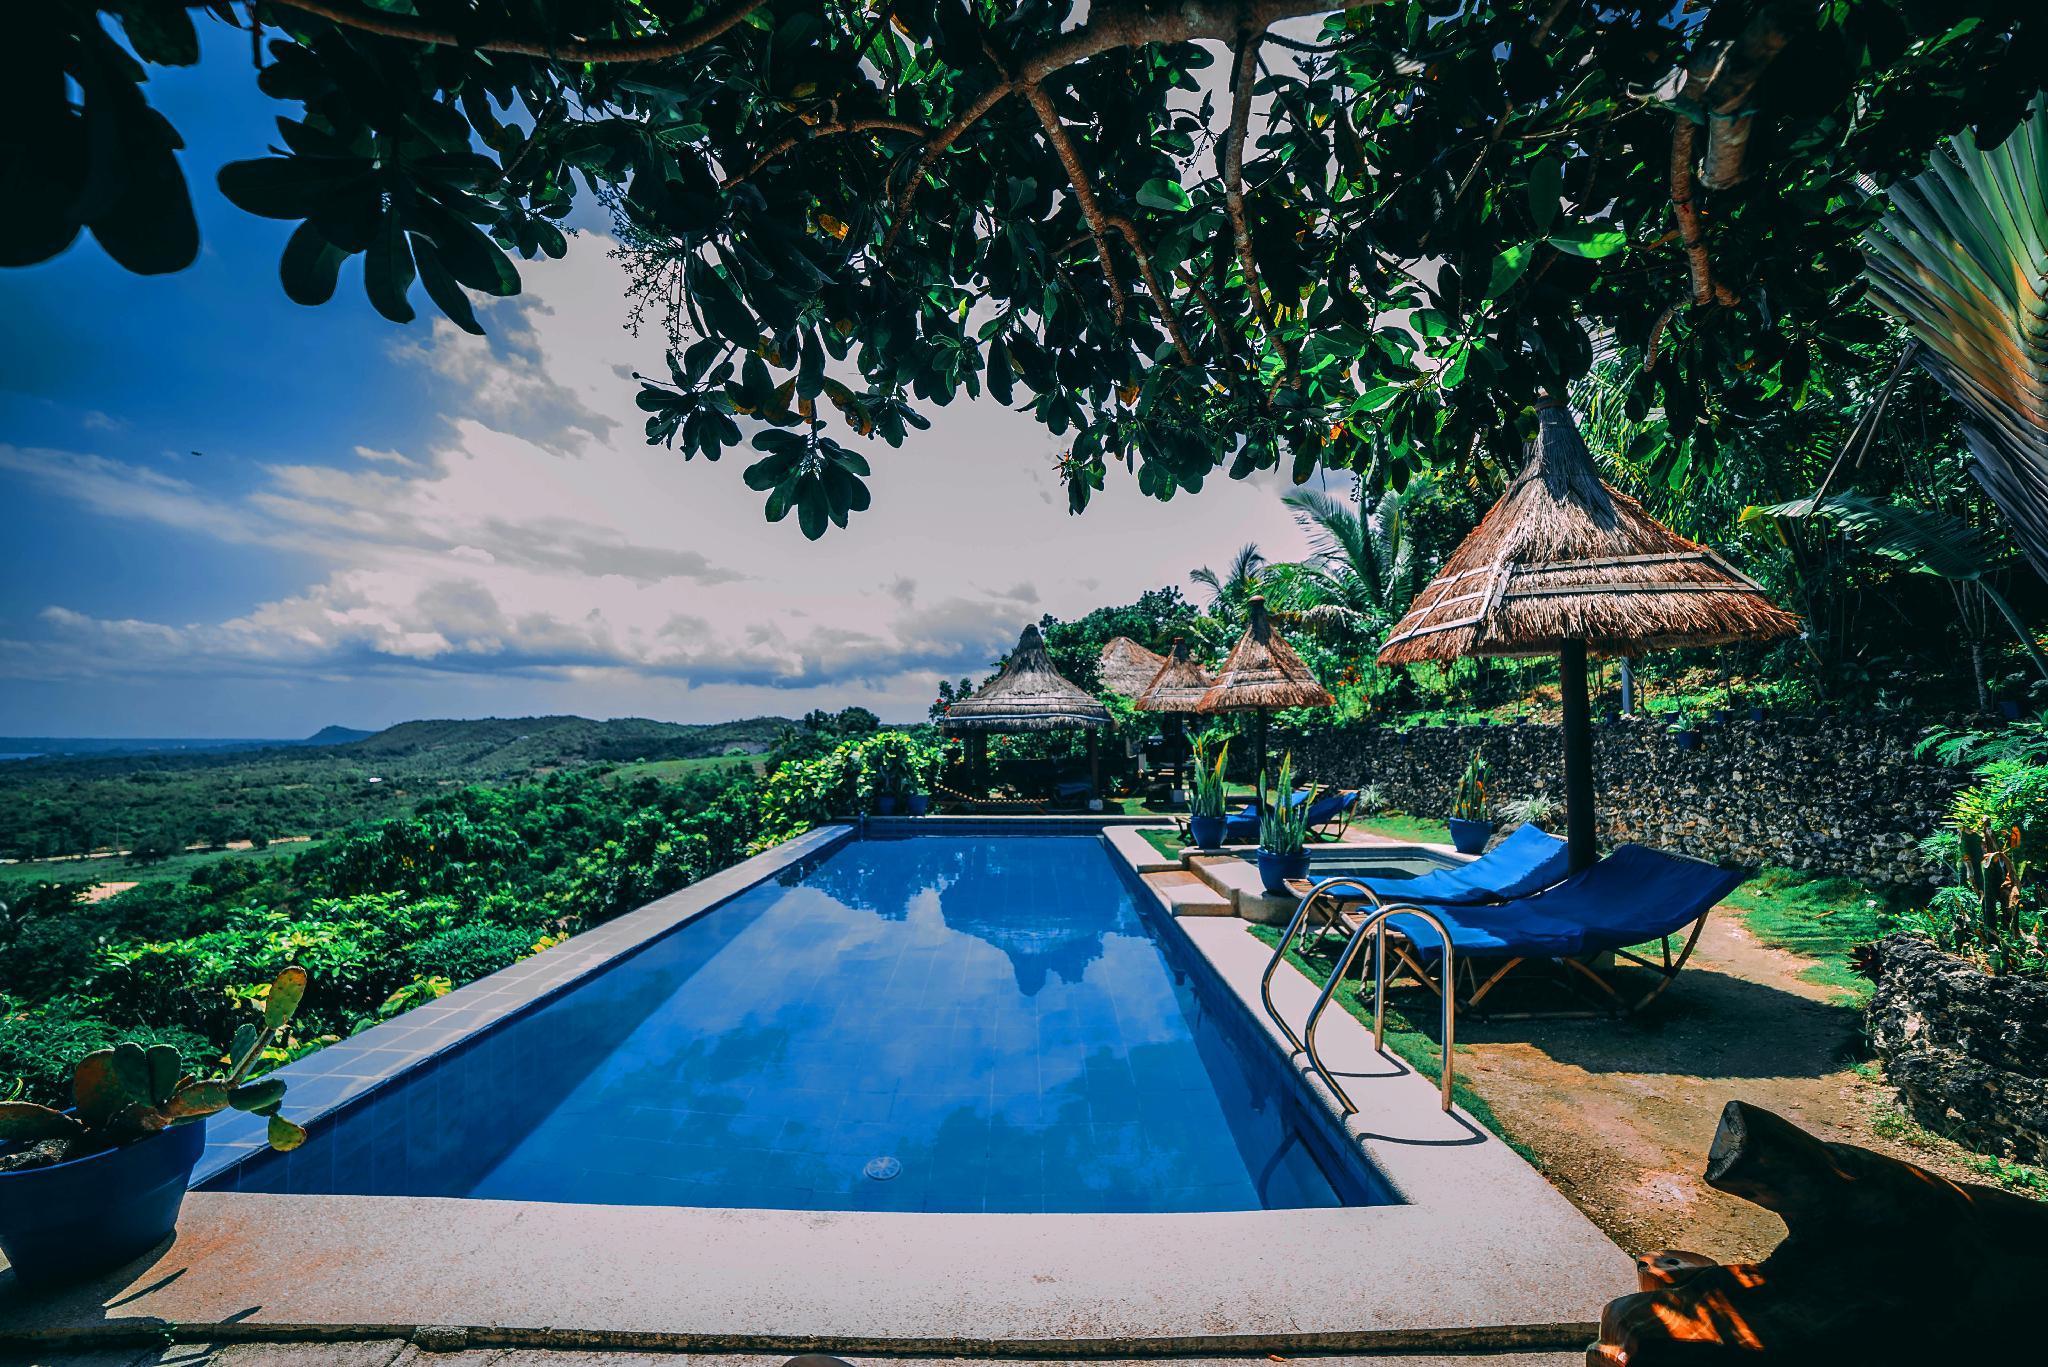 Marqis Sunrise Sunset Resort And Spa